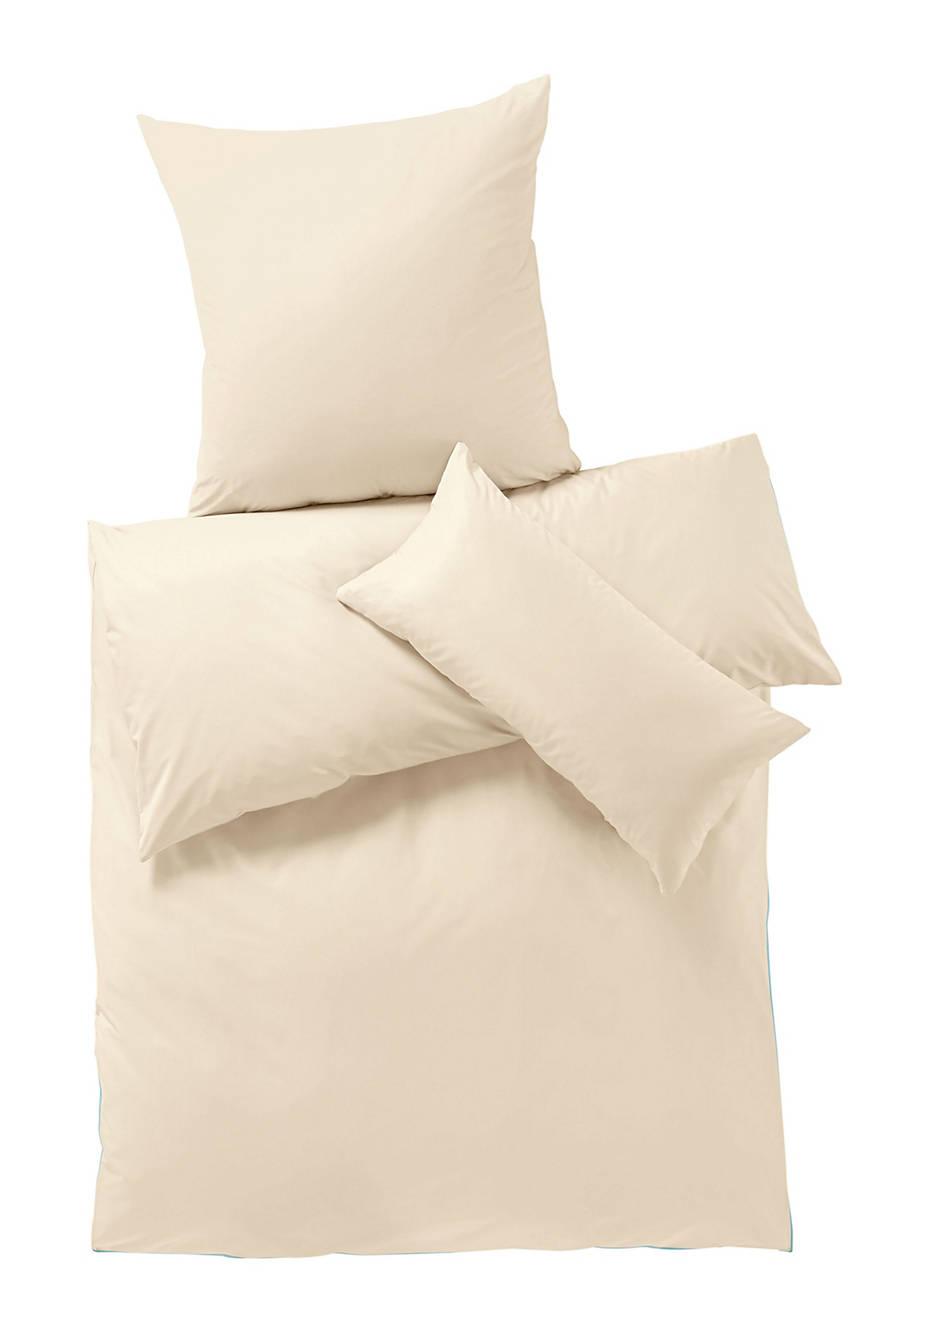 Renforcé-Bettdeckenbezug mit Hotelverschluss